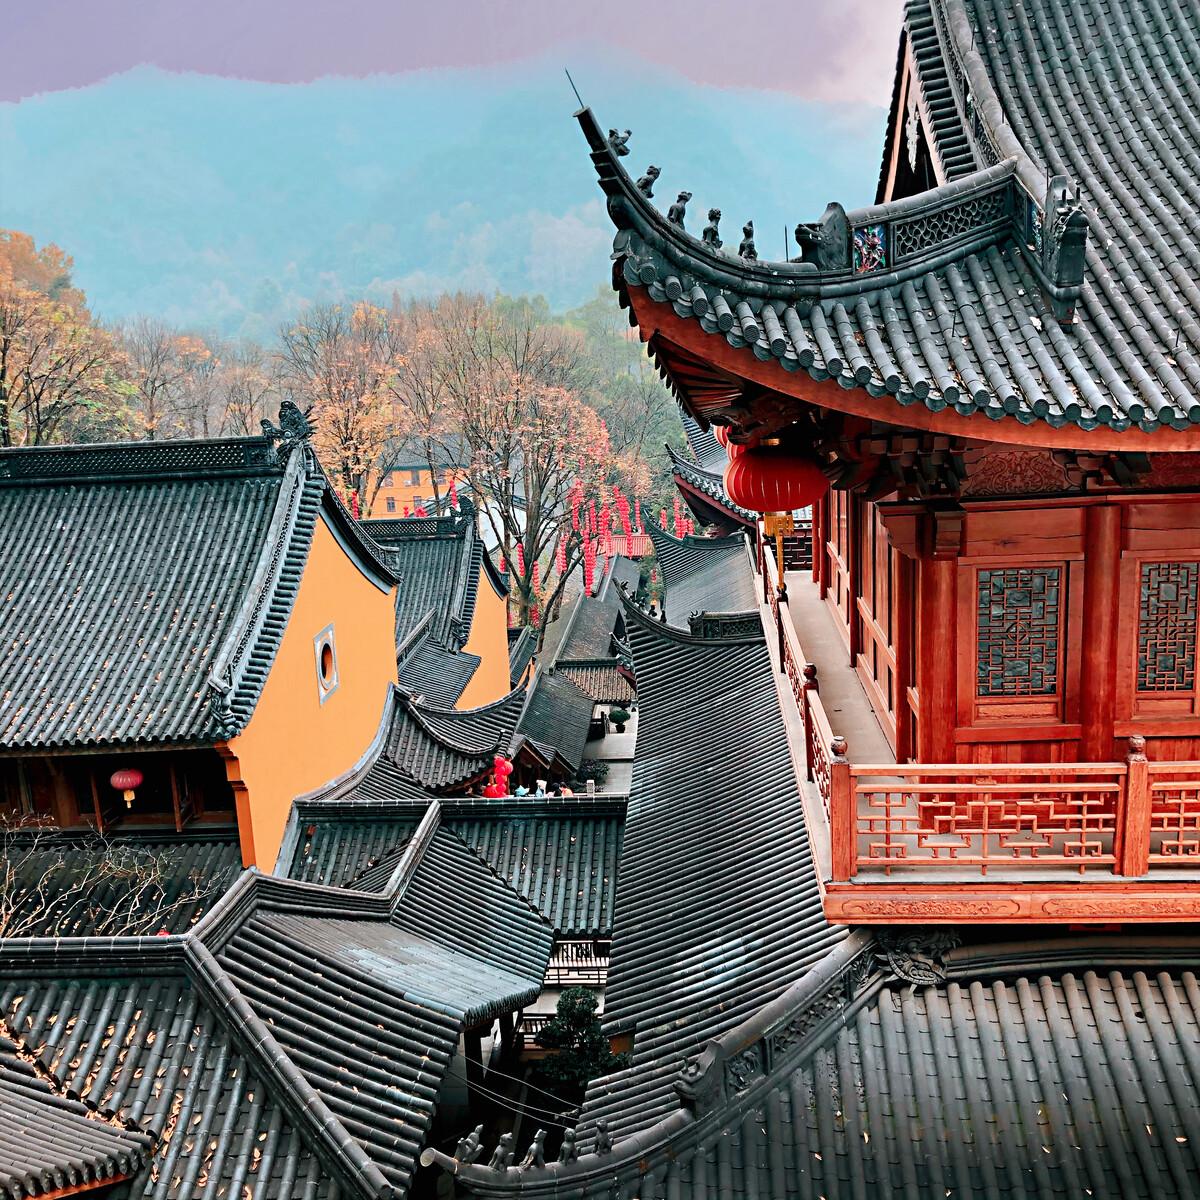 ysb官网-宁泽涛晒和女生亲密合影疑似公开恋情,网友:祝福,看上去很般配